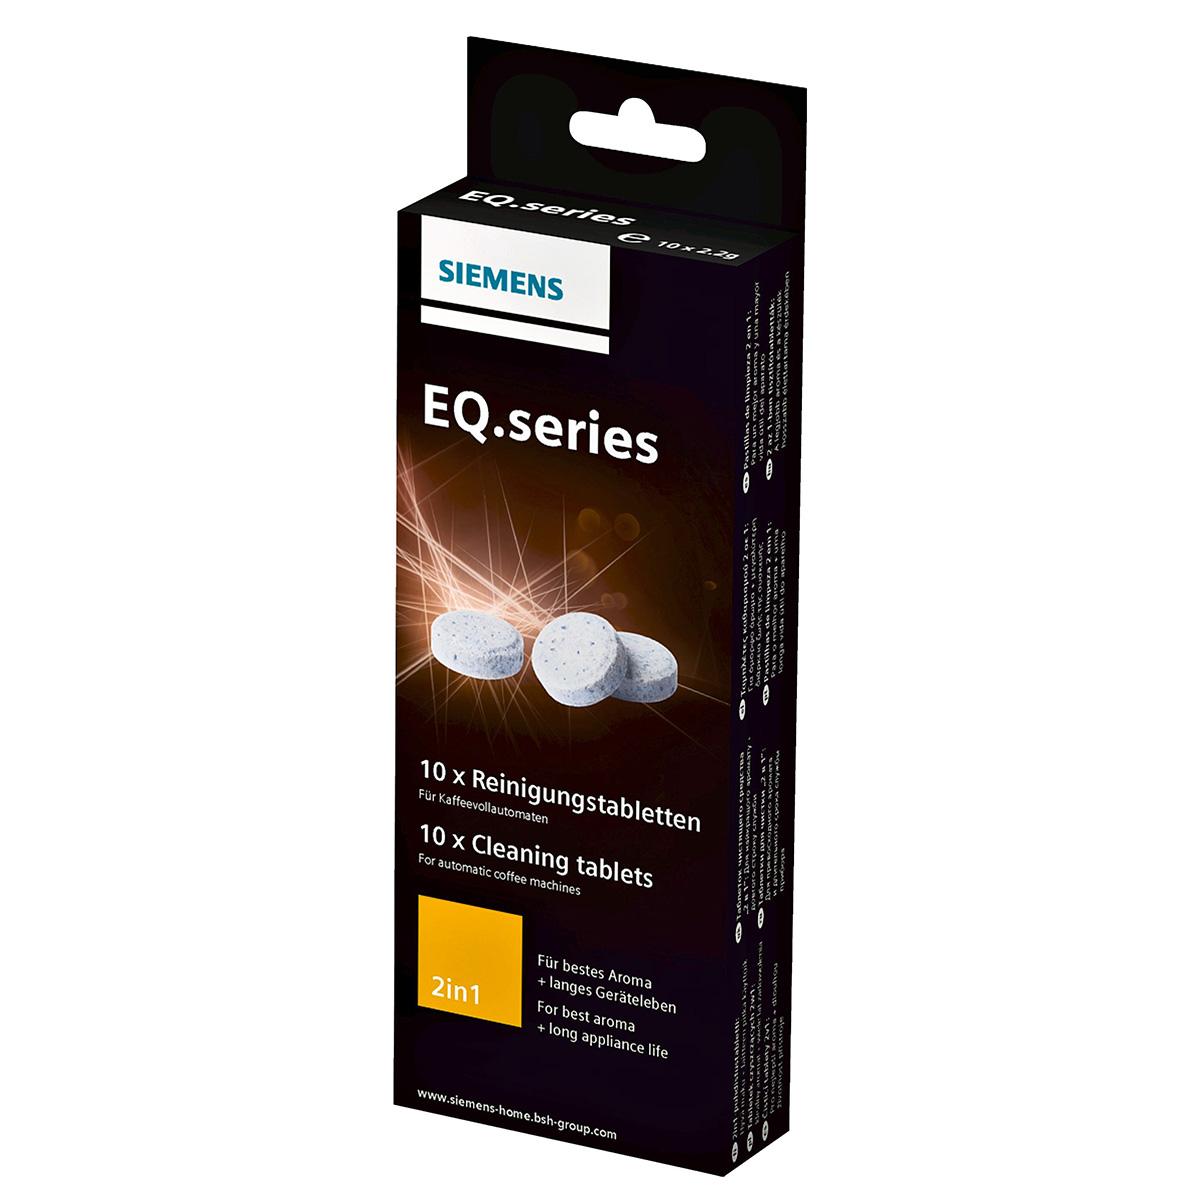 Siemens rengørings- og afkalkningstabletter - EQ.series